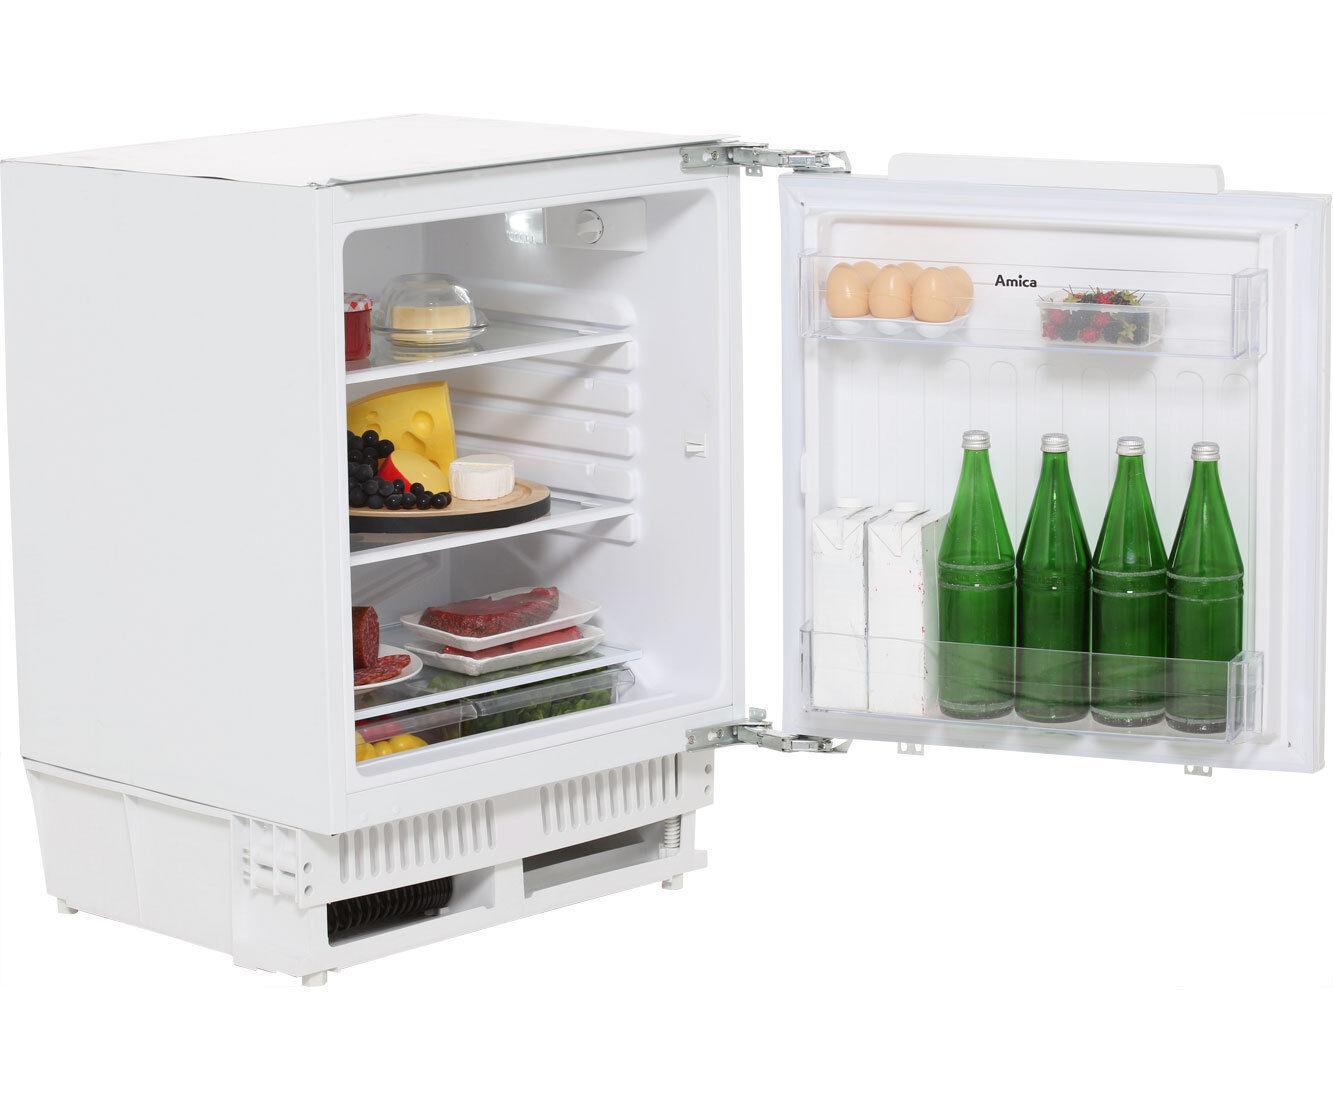 Amica Kühlschrank Ks 15195 W : Amica kühlschrank ks w amica ks w kühlschrank mit